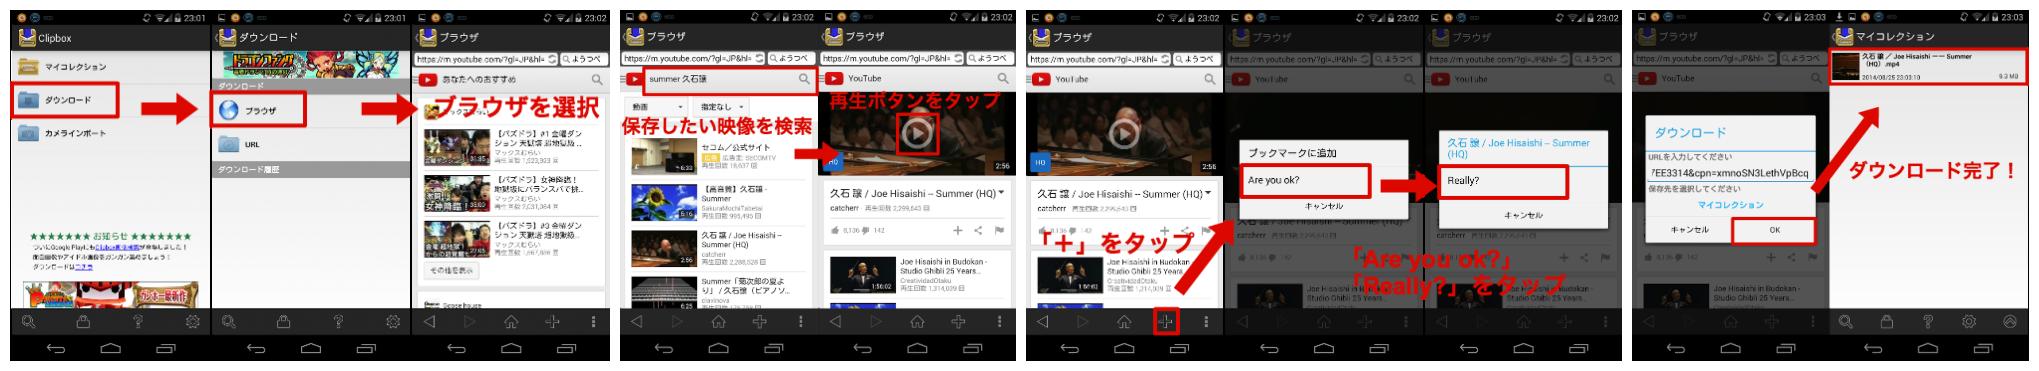 share movie ダウンロード android